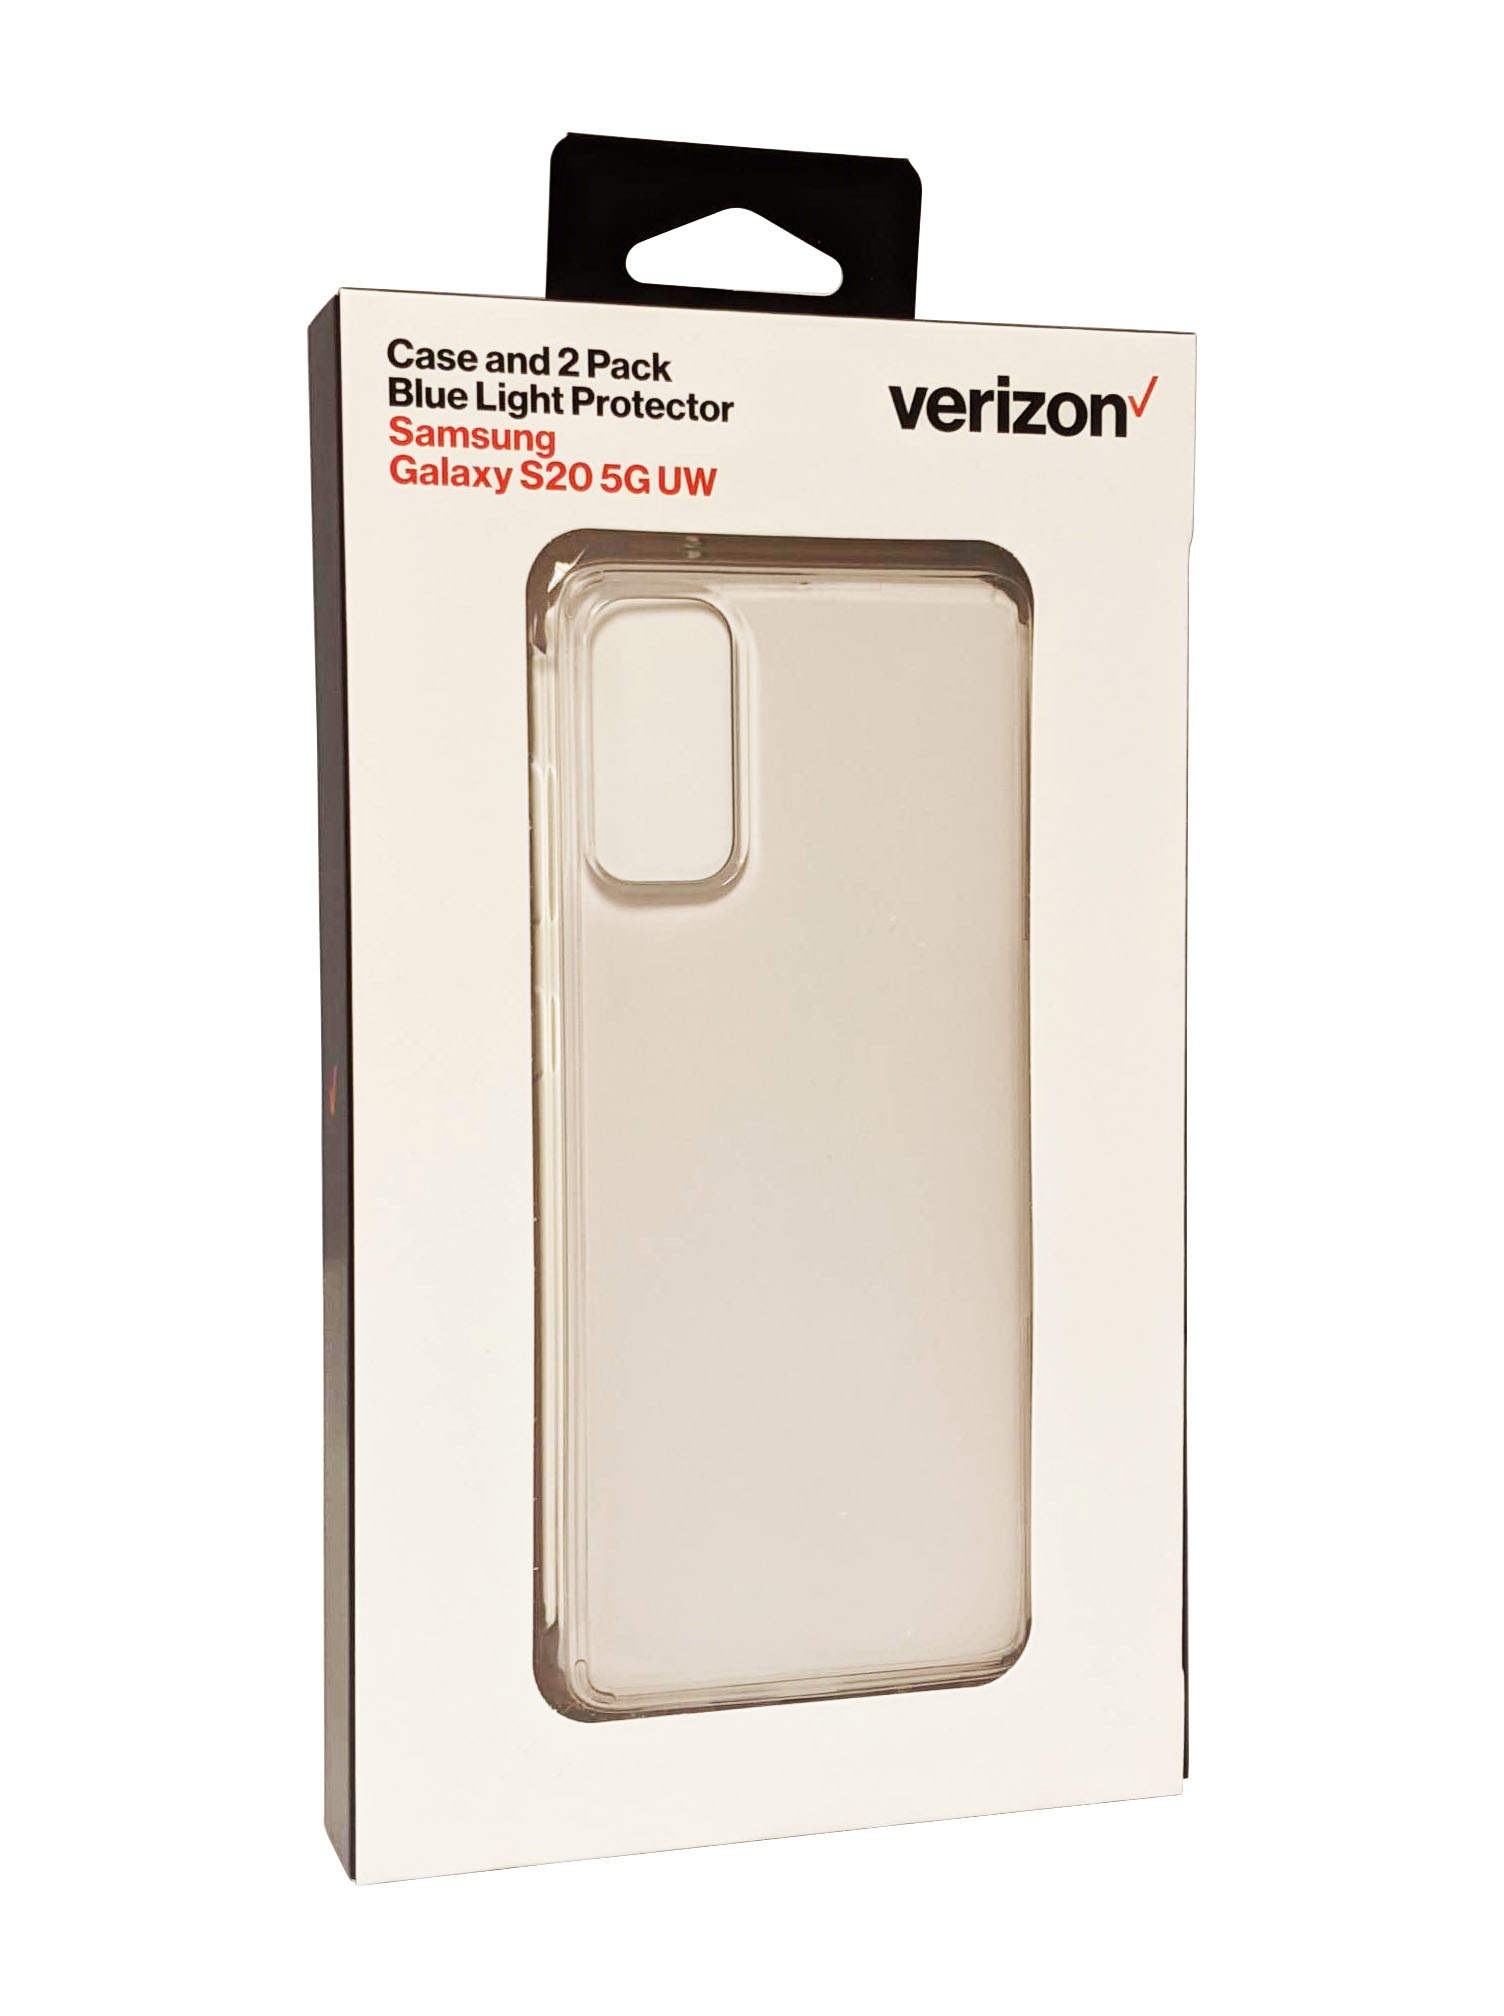 Verizon Bundle for Galaxy S20 5G UW Clarity Case & Blue Light Screen Protector